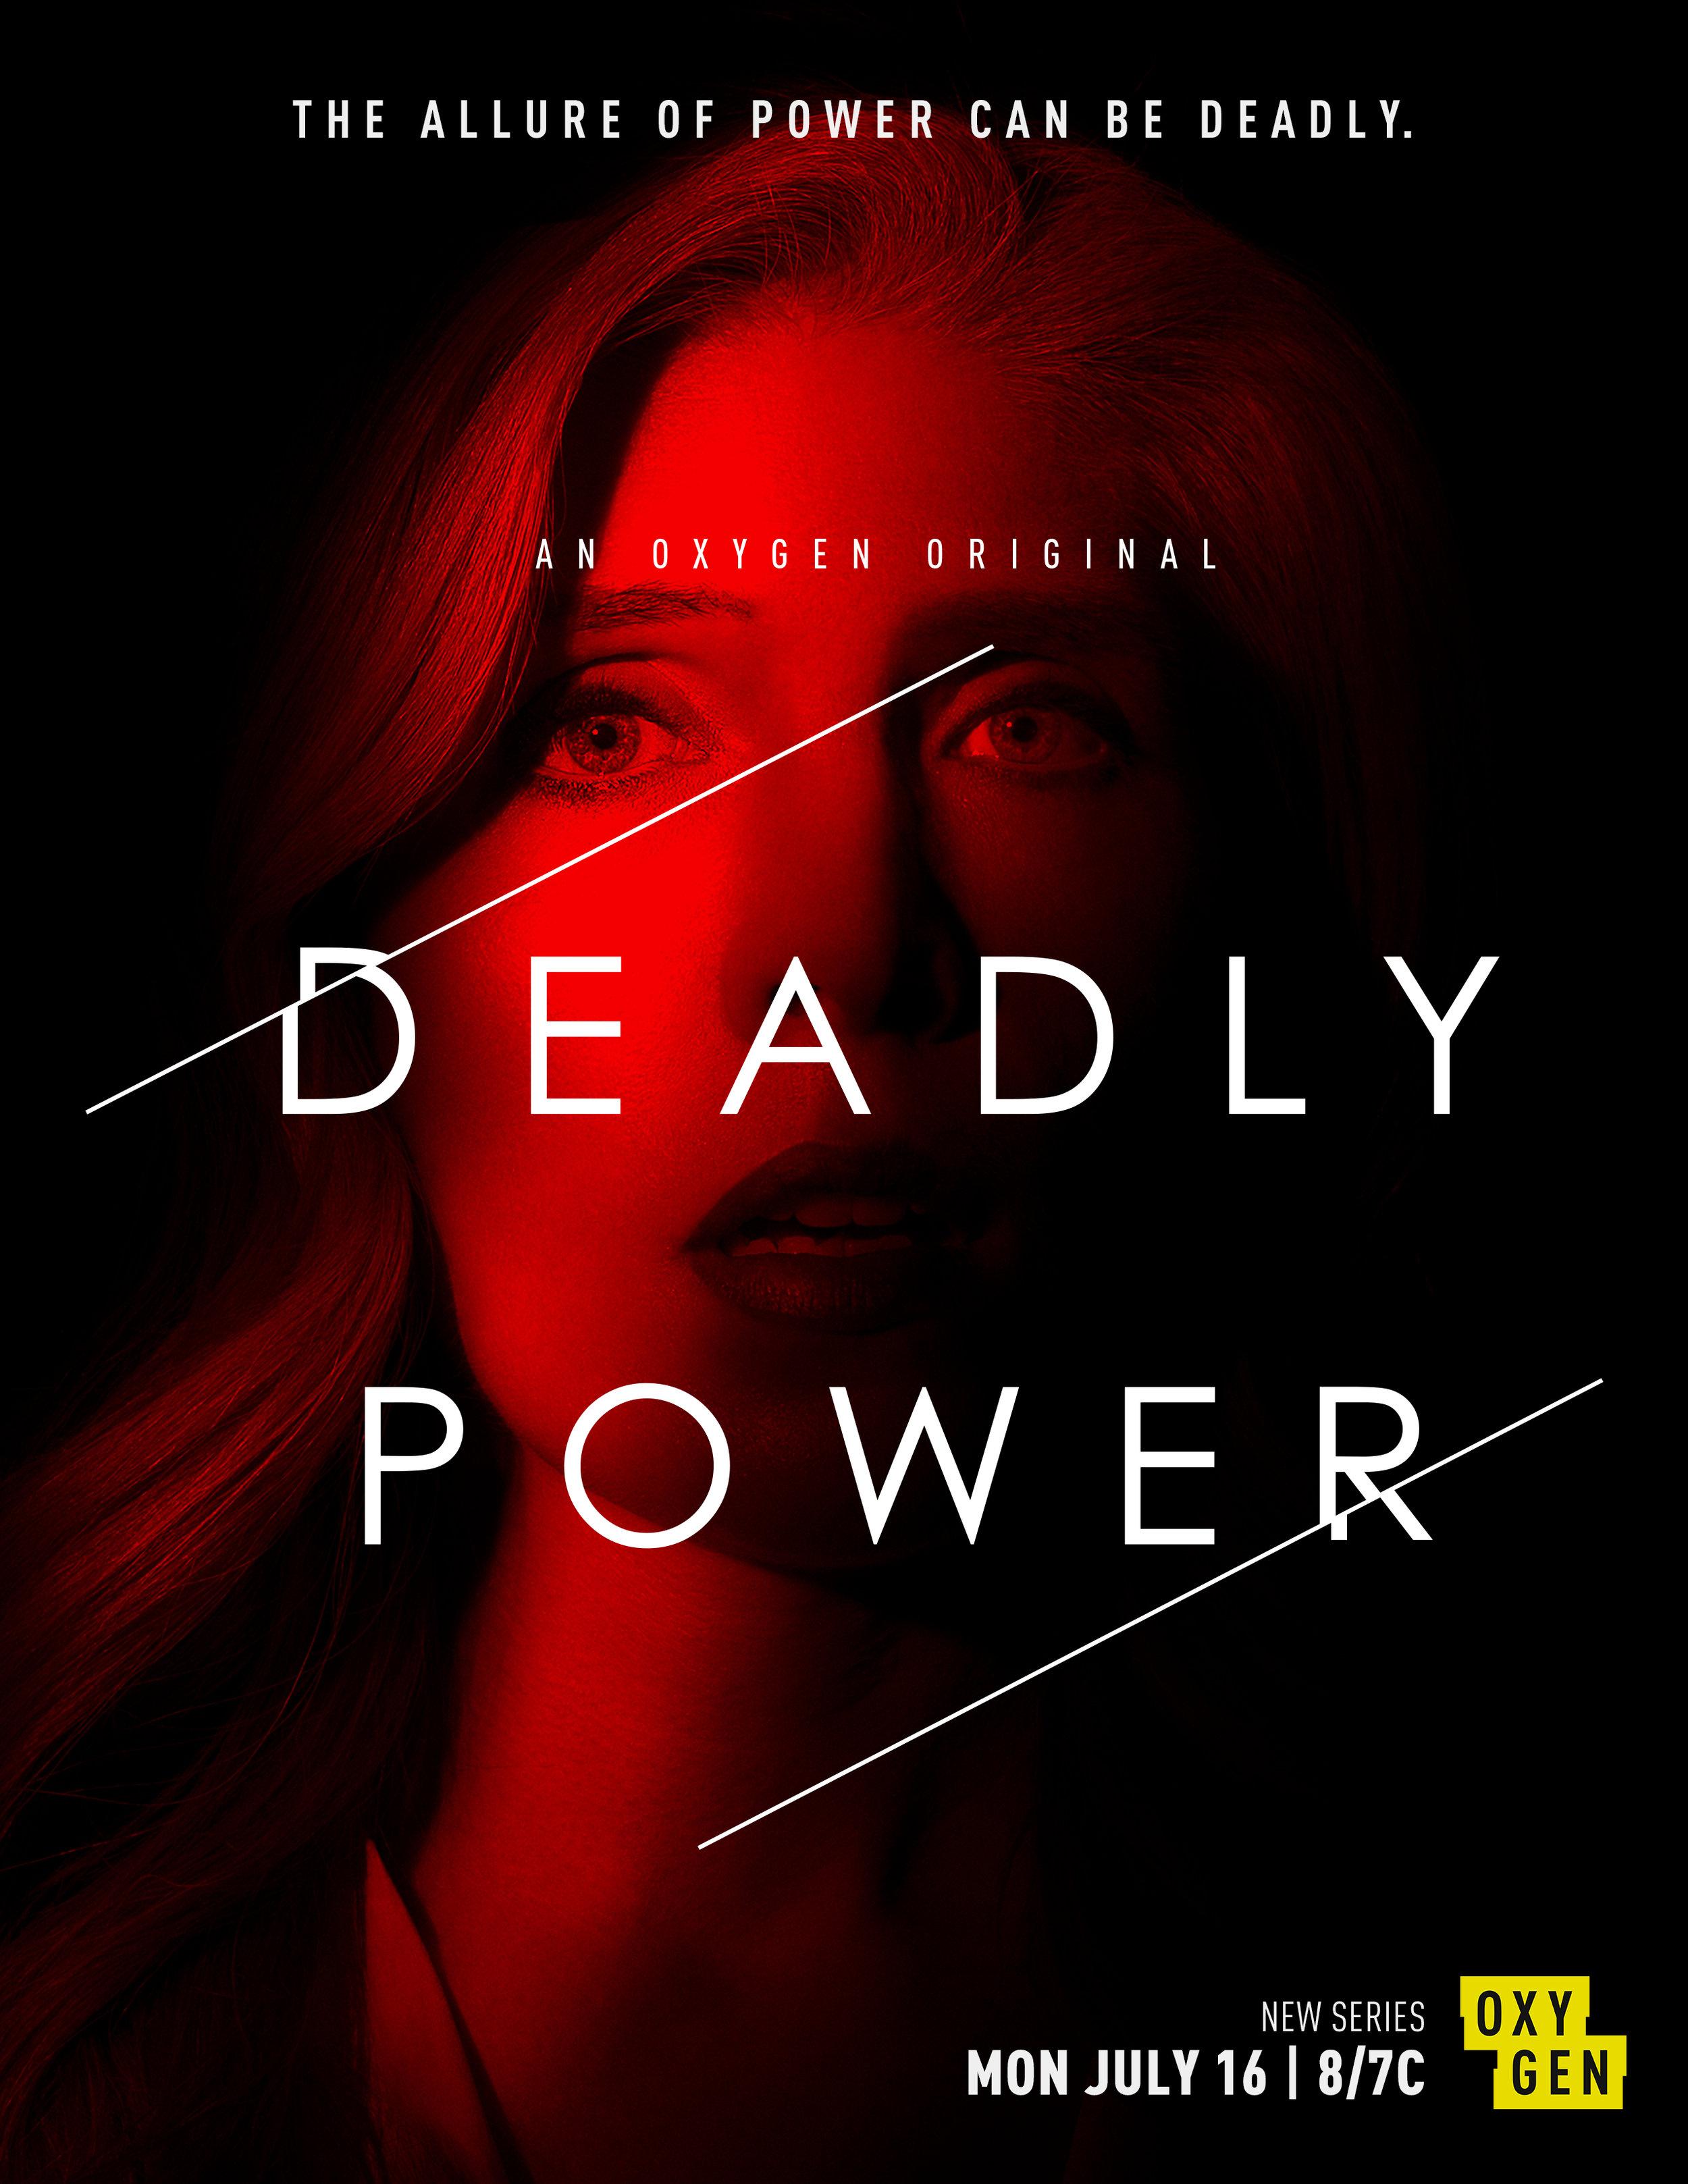 Deadly_Power_KeyArt8.5x11_300dpi_Thea.jpg